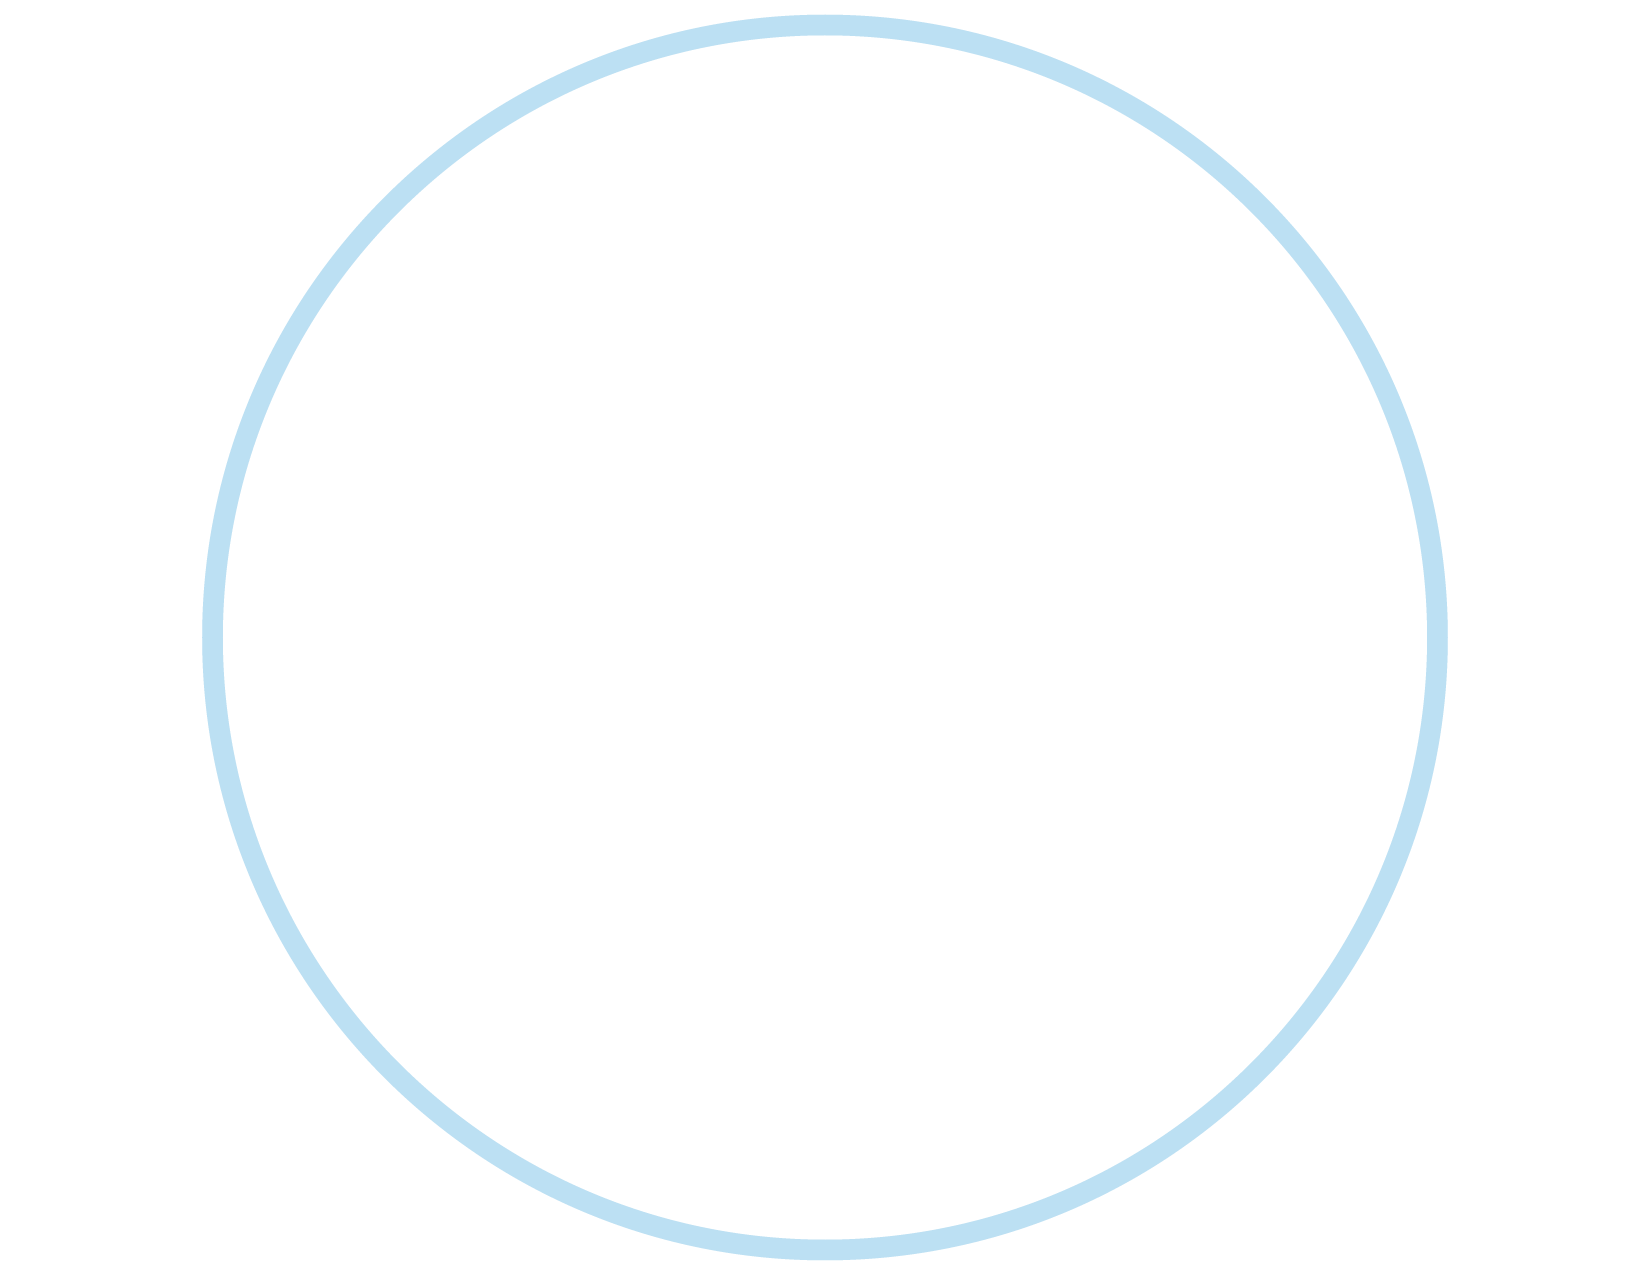 variety_logo_black-01.png